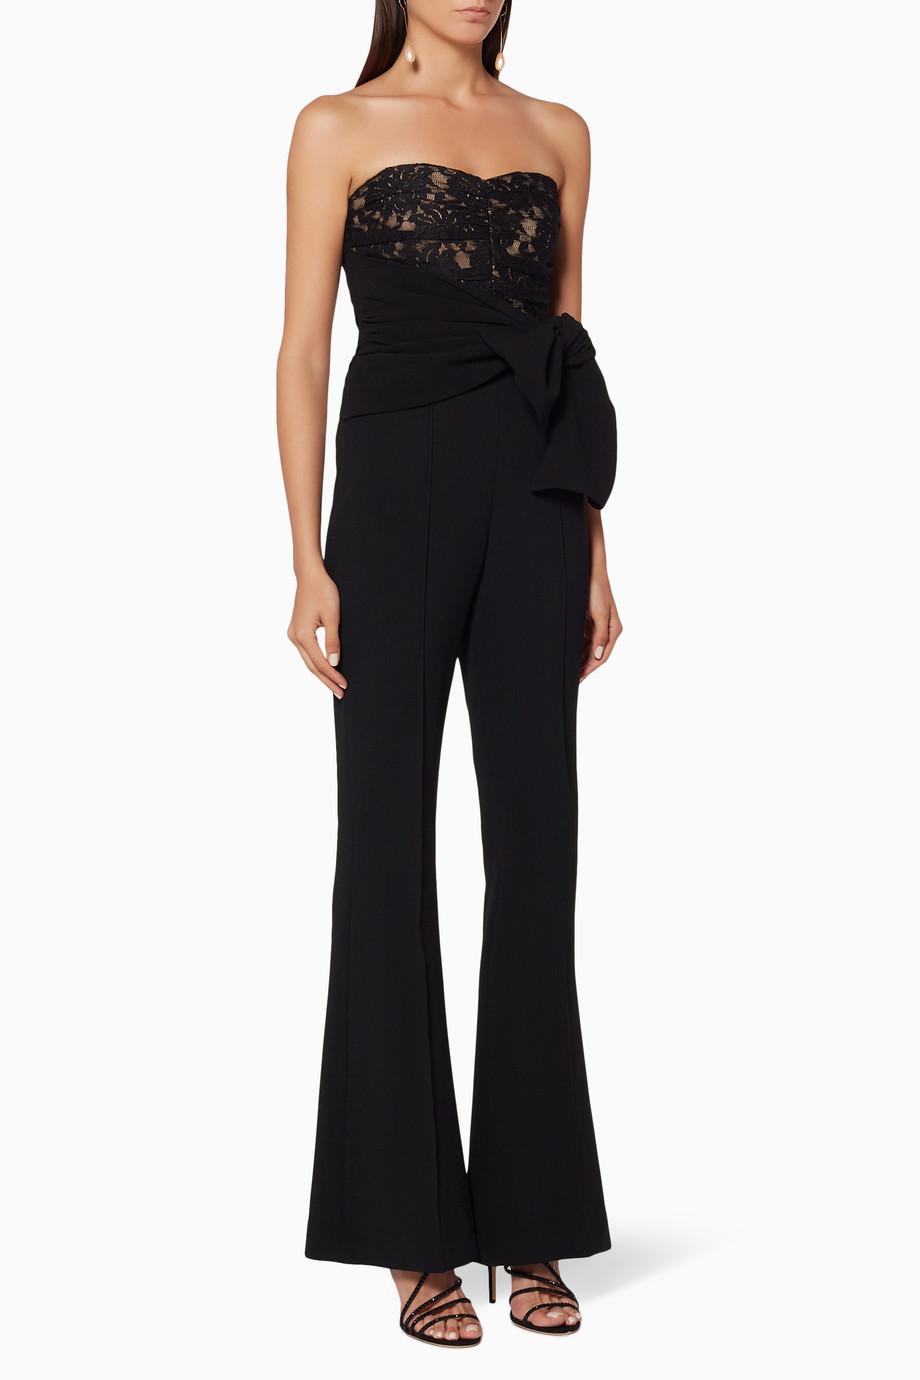 ef9412ca689 Shop Rebecca Vallance Black Black Strapless Betty Jumpsuit for Women ...